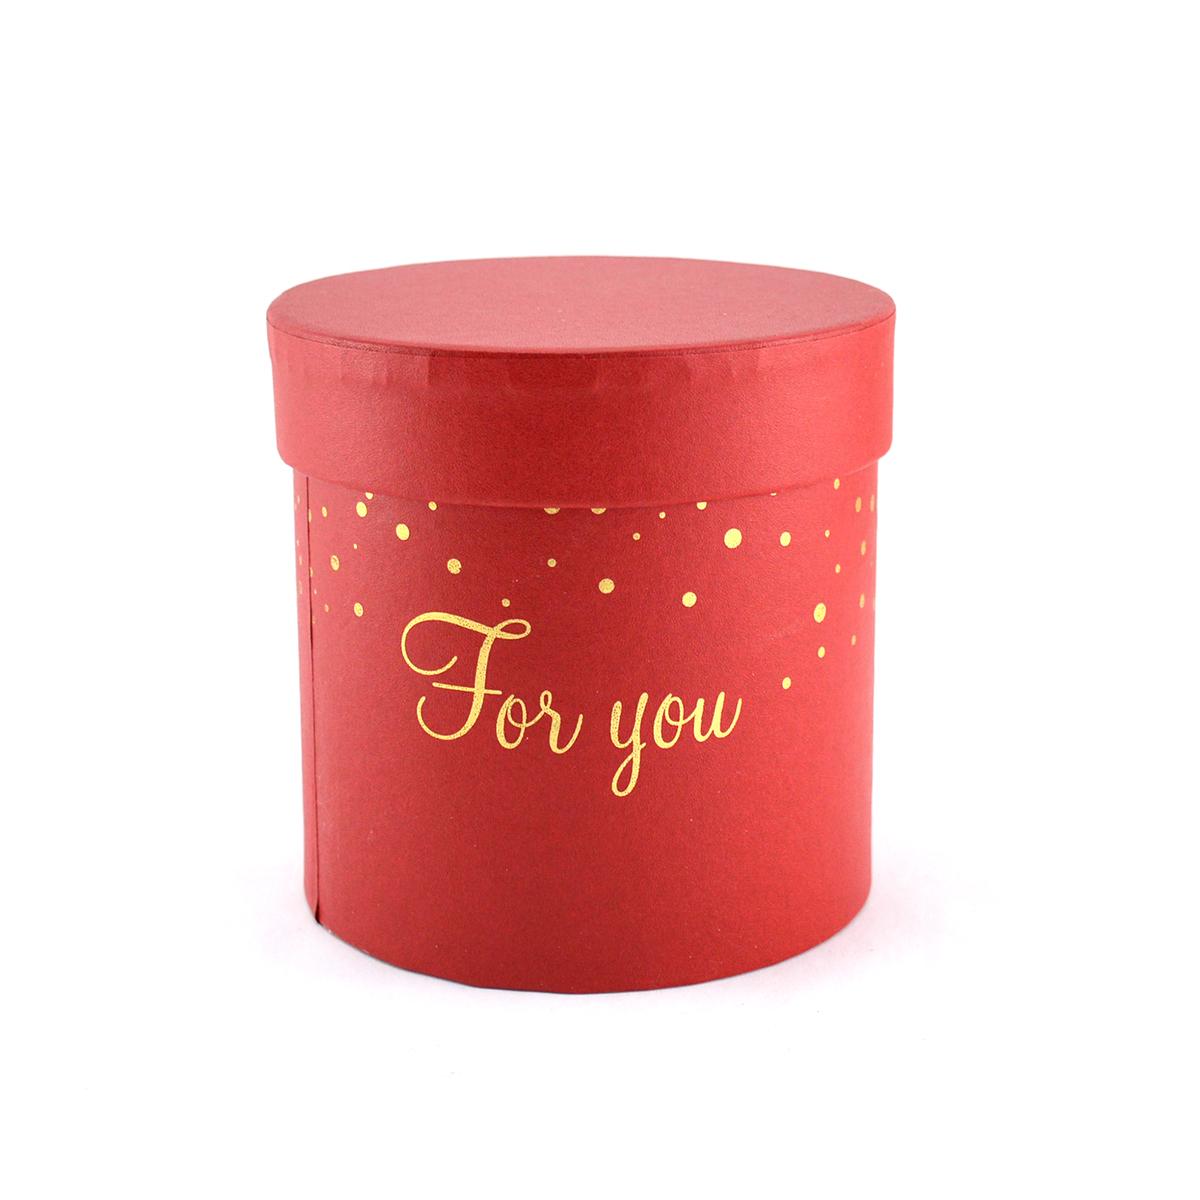 Cutie cilindrica fara manere for you rosie